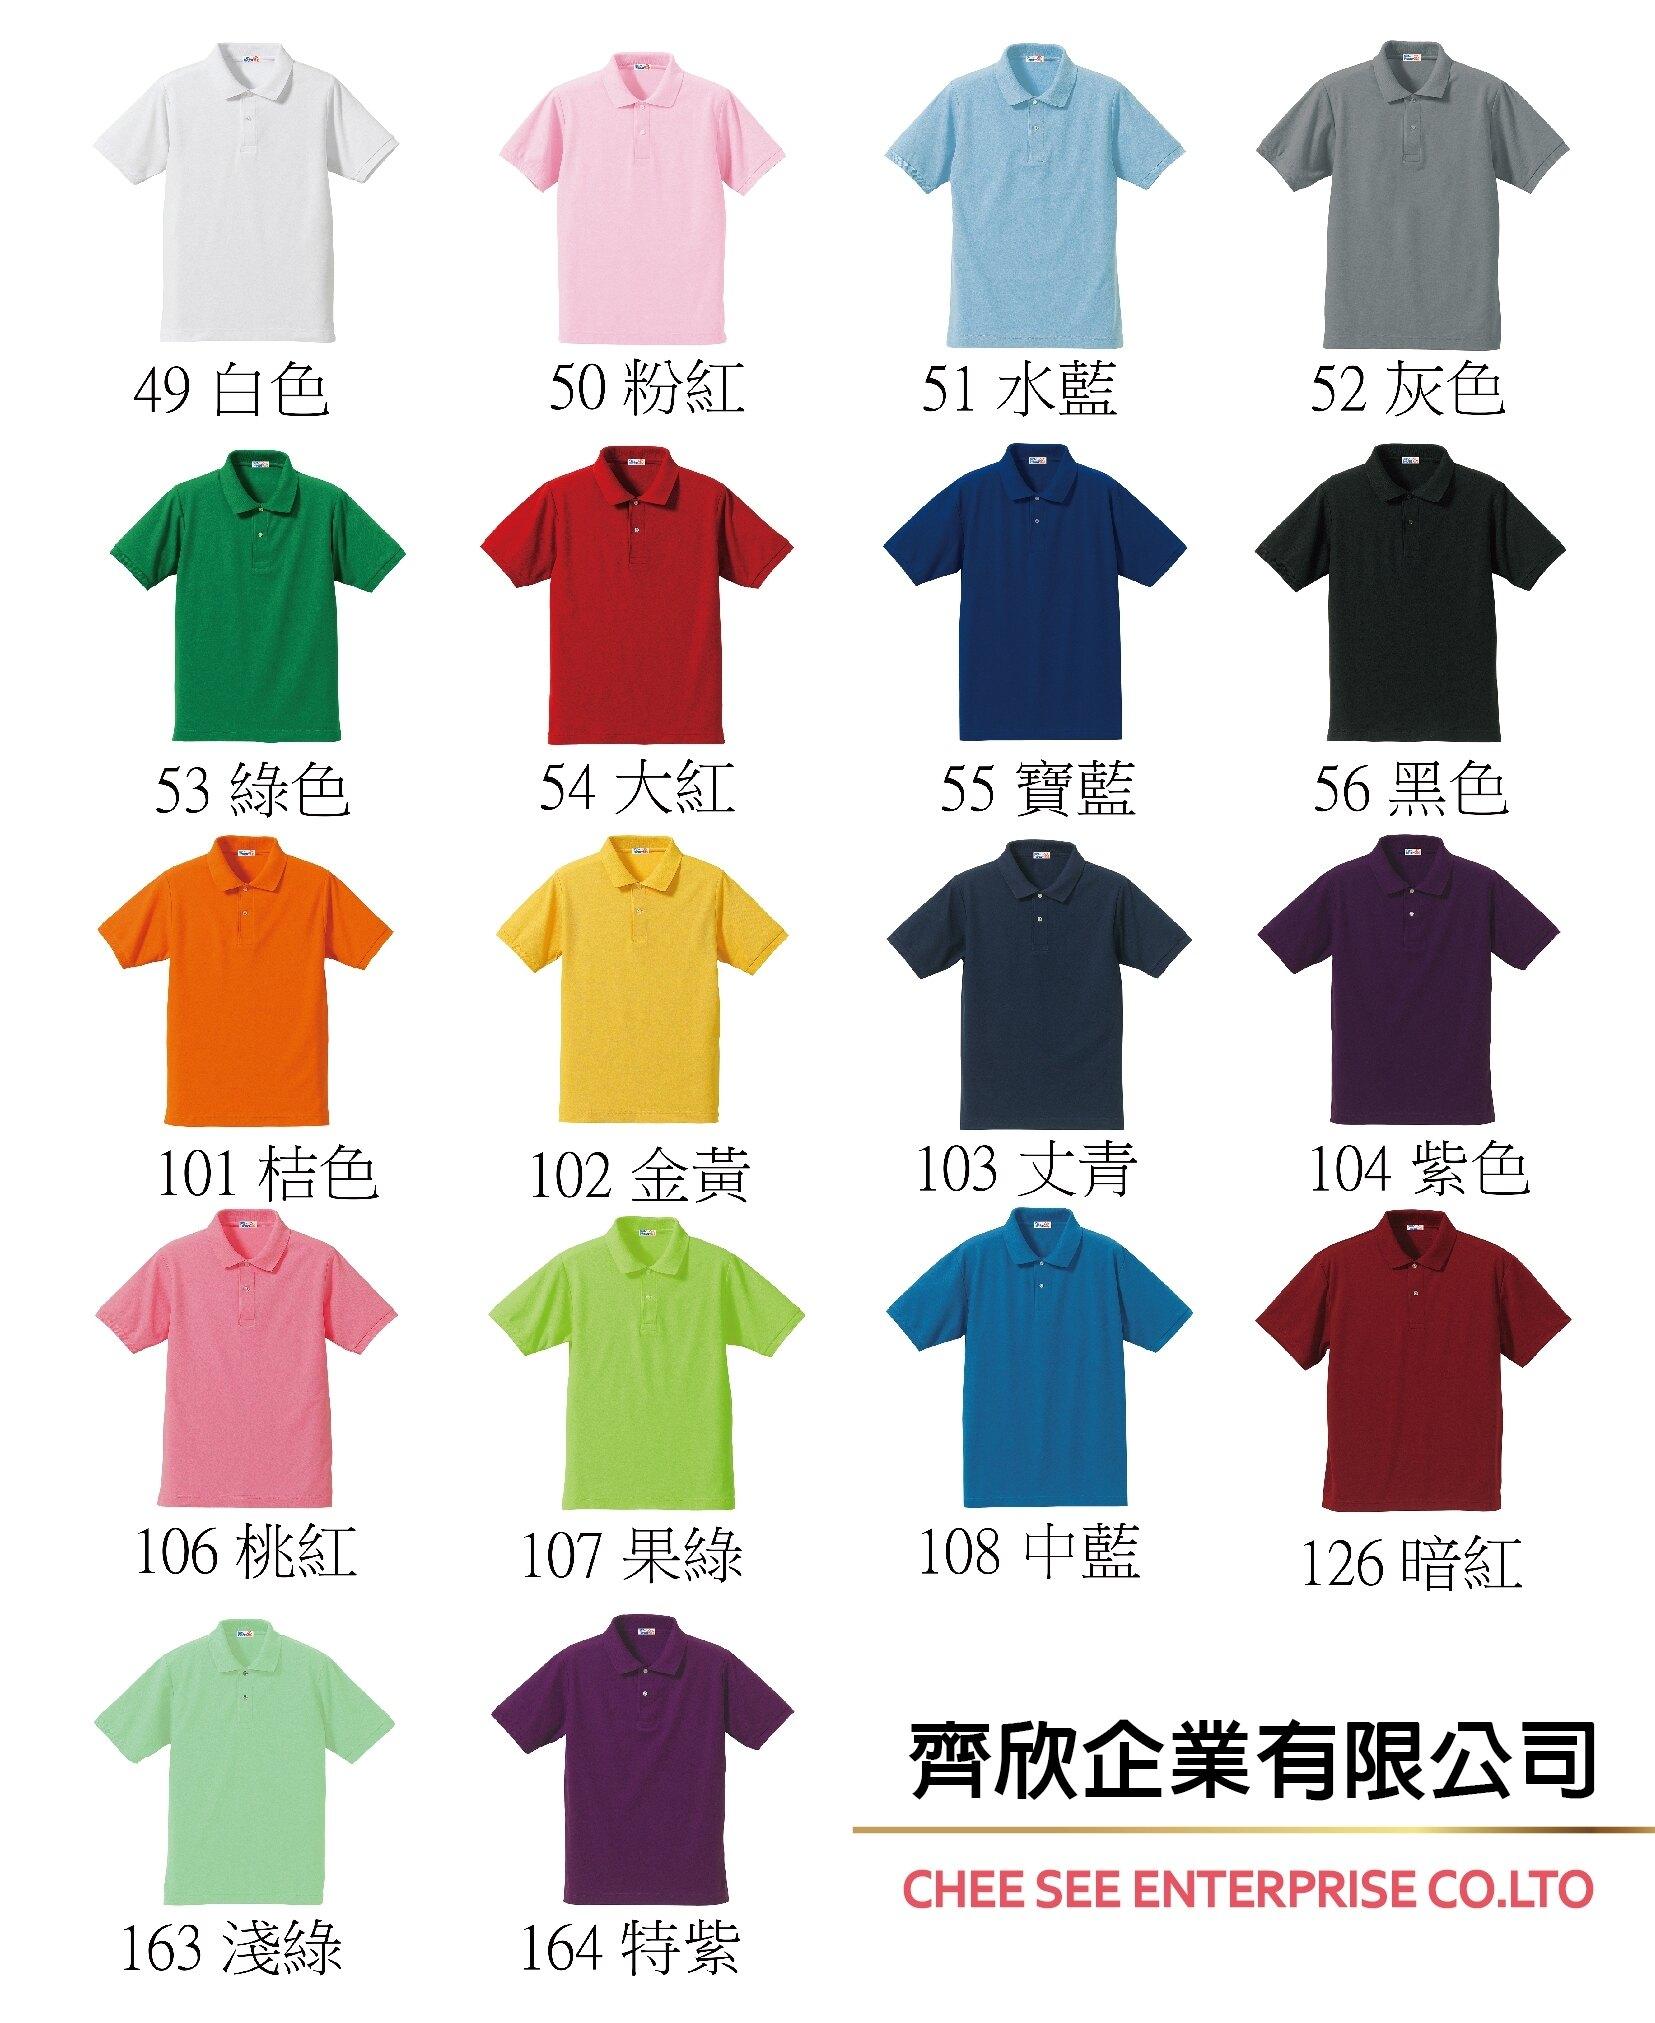 HI-Cool Polo shirts 台灣製作中空紗吸濕排汗Polo衫-中藍色,團體服可以專業訂製